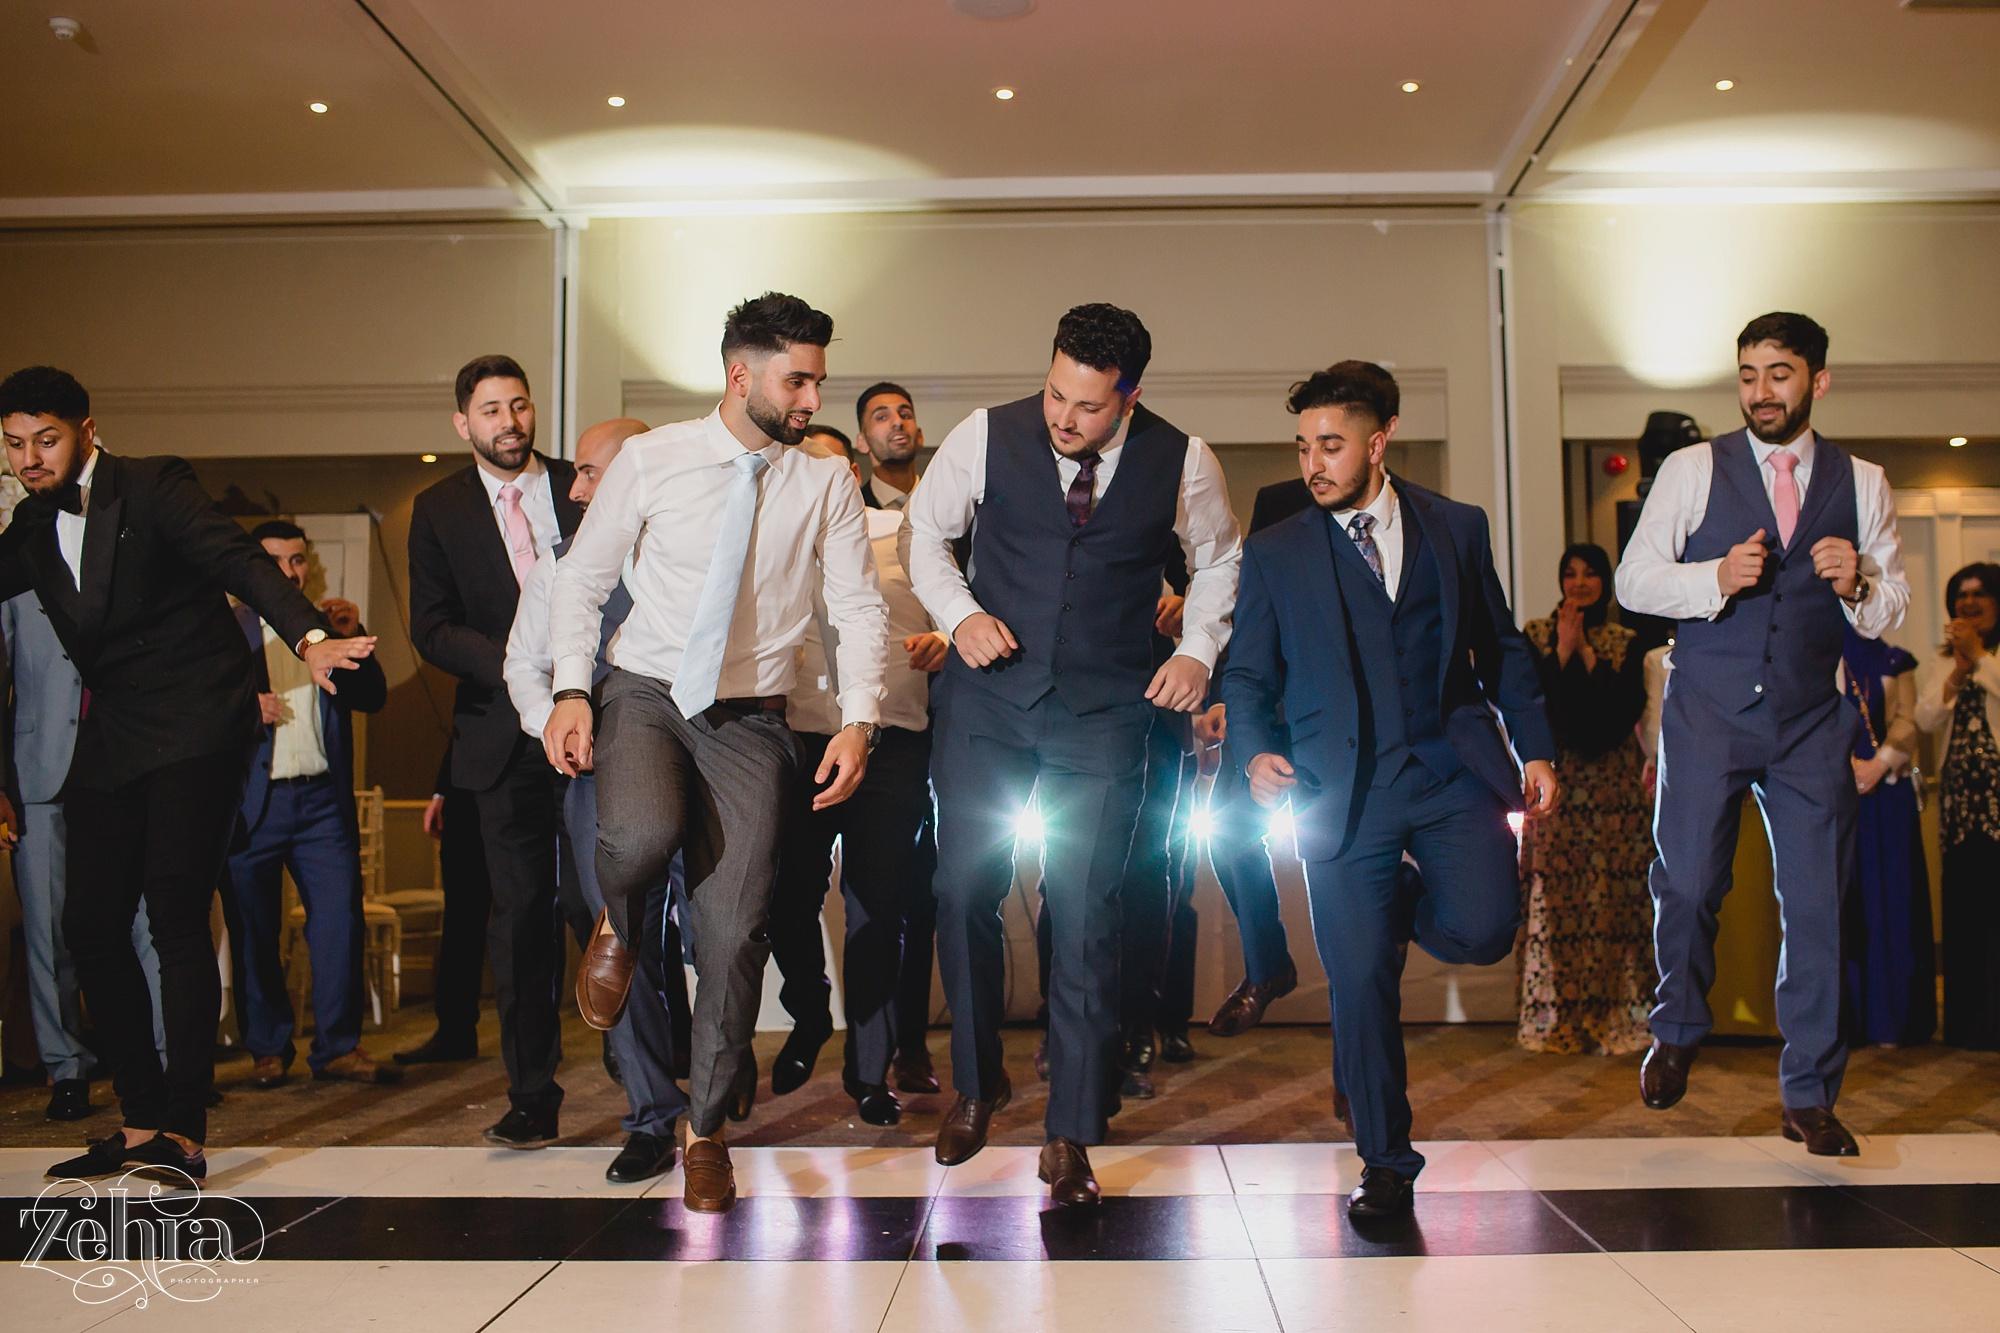 zehra photographer mere cheshire wedding_0063.jpg